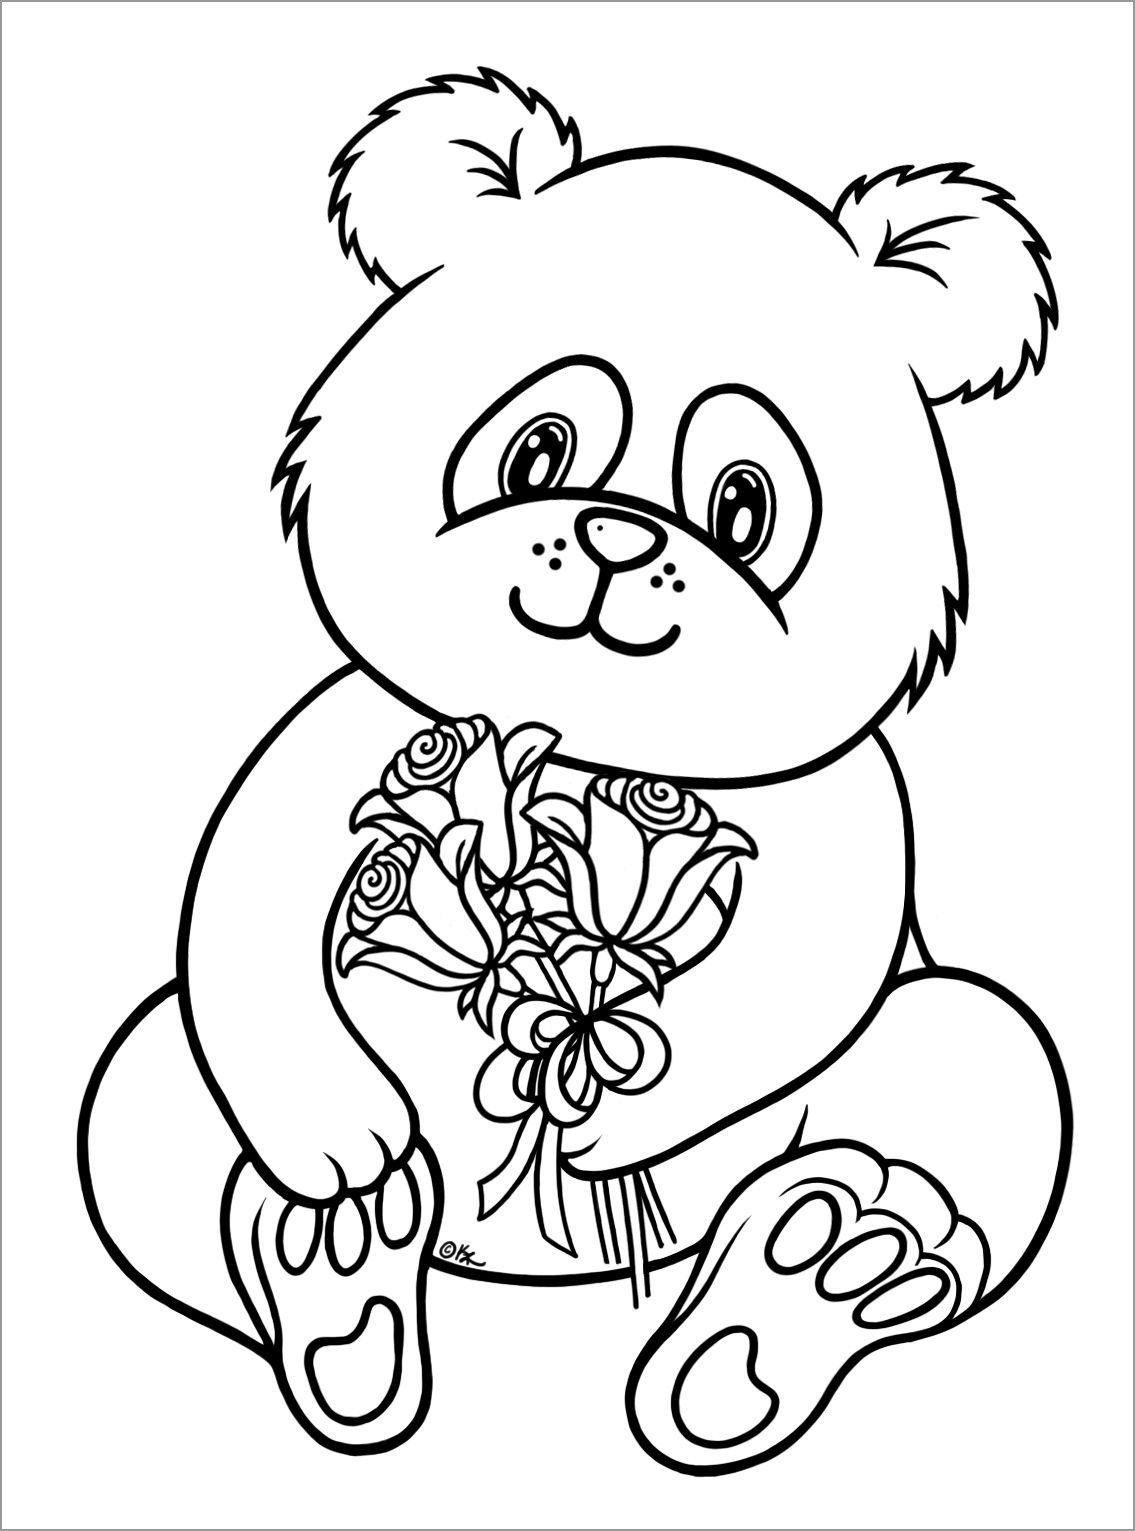 Cute Panda Coloring Pages Cute Baby Panda Coloring Pages To Print Coloringbay Bear Coloring Pages Unicorn Coloring Pages Panda Coloring Pages